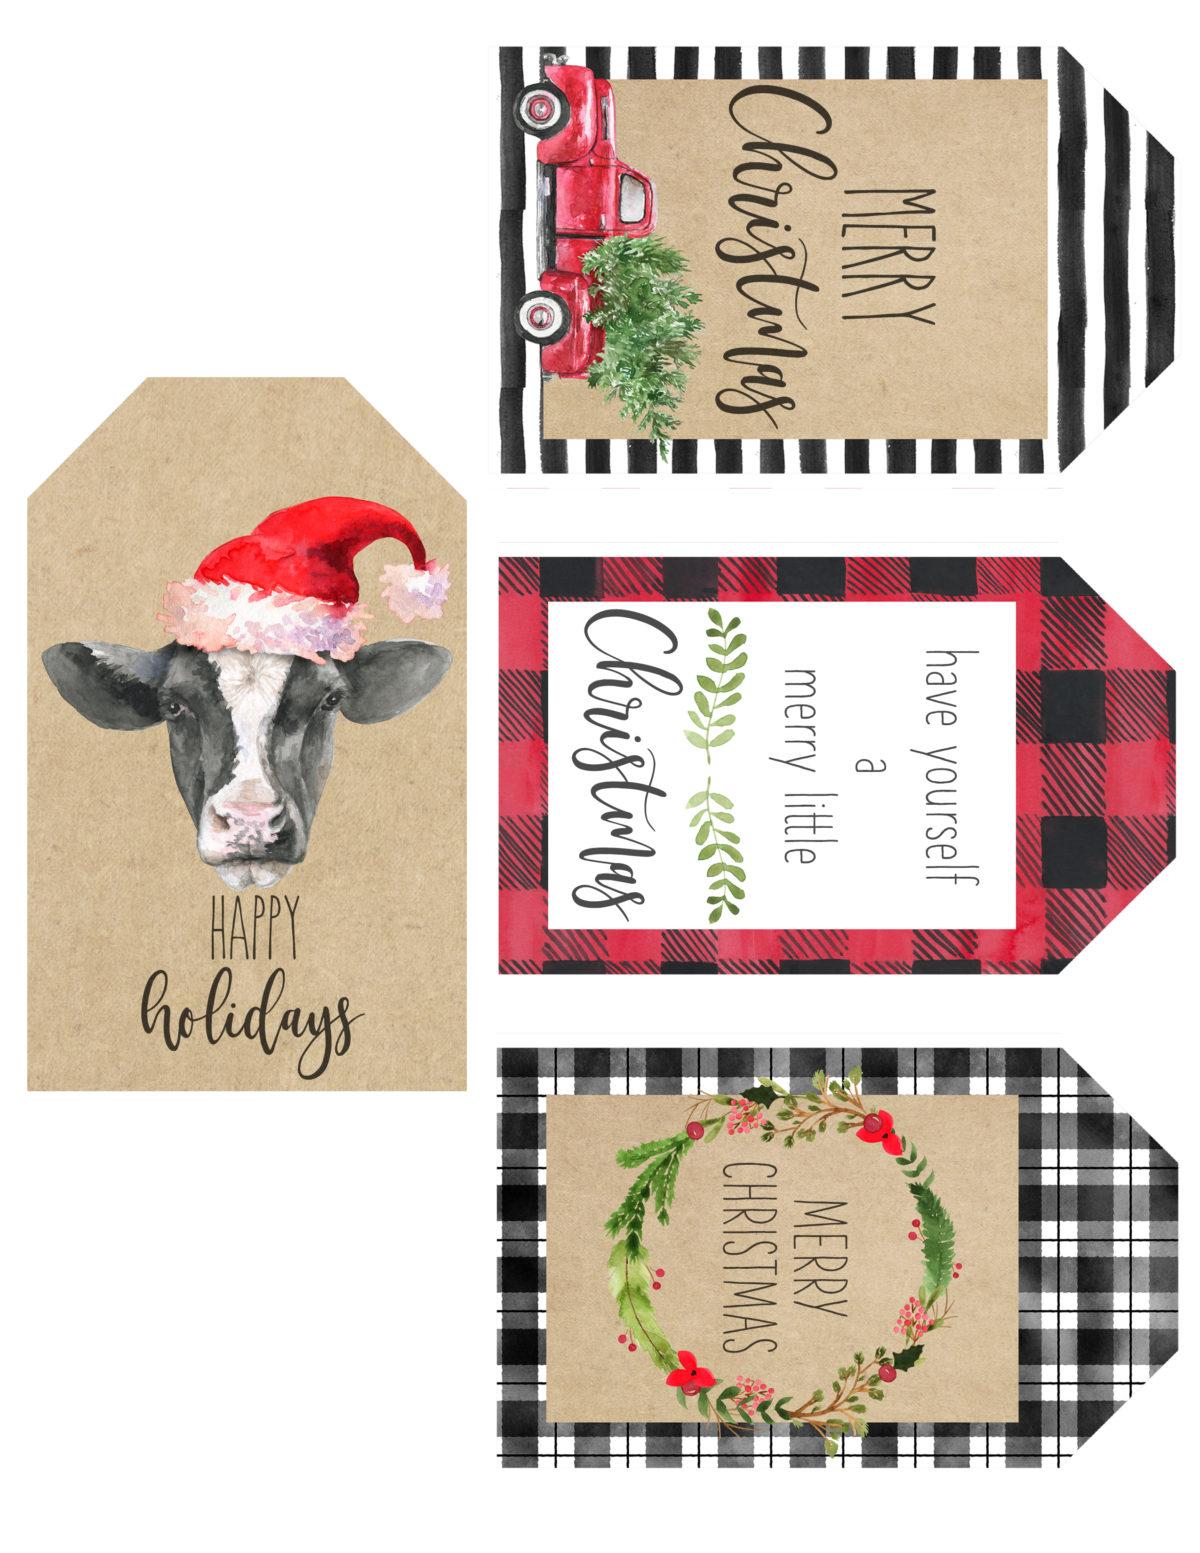 Free Printable Christmas Gift Tags - Shanty 2 Chic